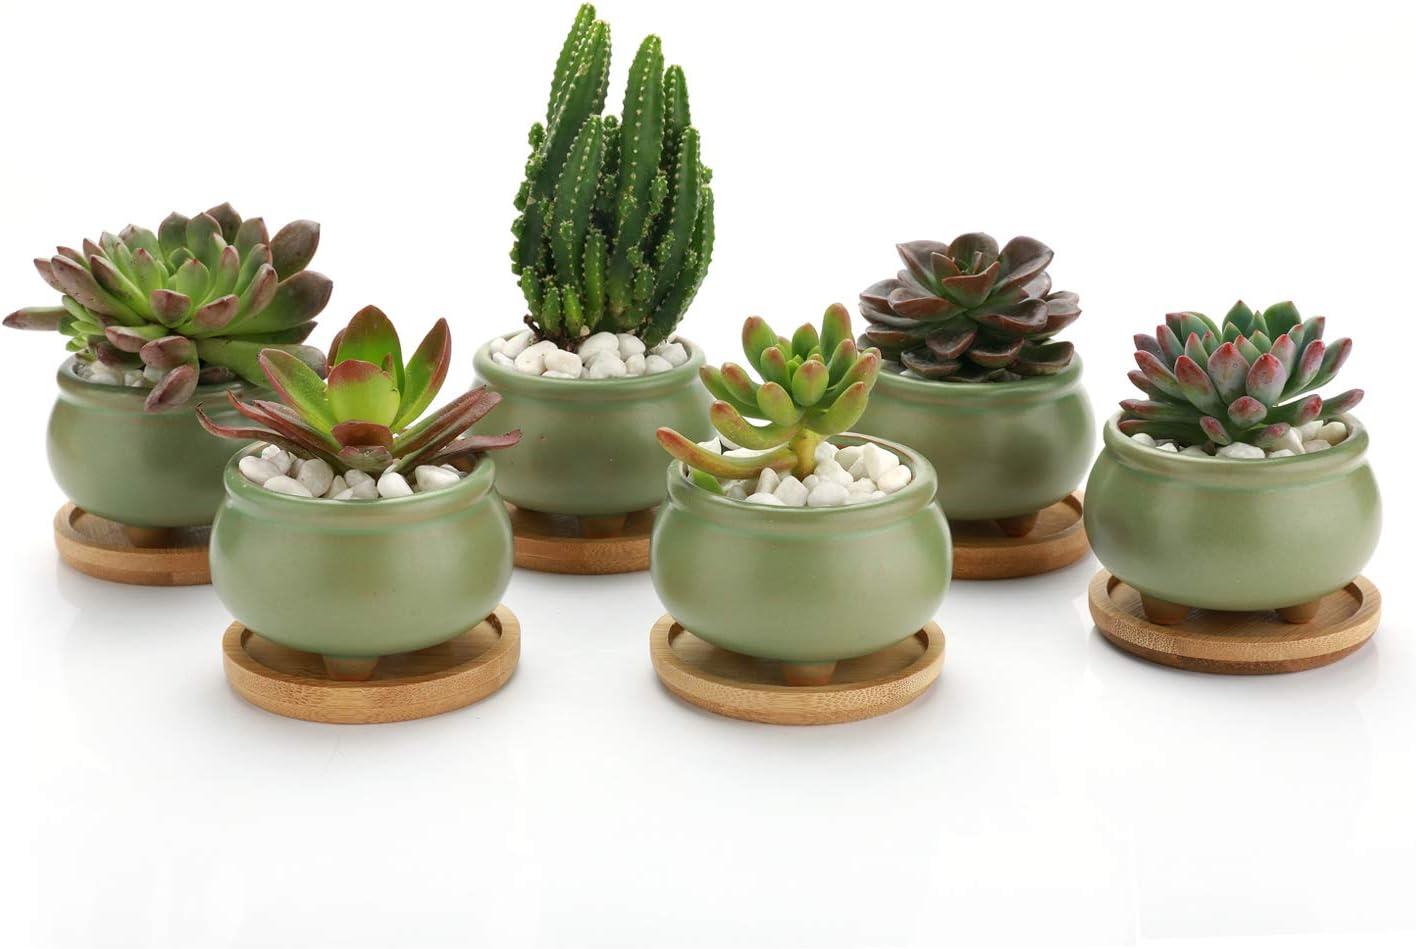 T4U 3 Inch Succulent Planters Pots Ceramic - Set of 6, Mini Cactus Planters Clay Pots Window Boxes for Home Decor Green